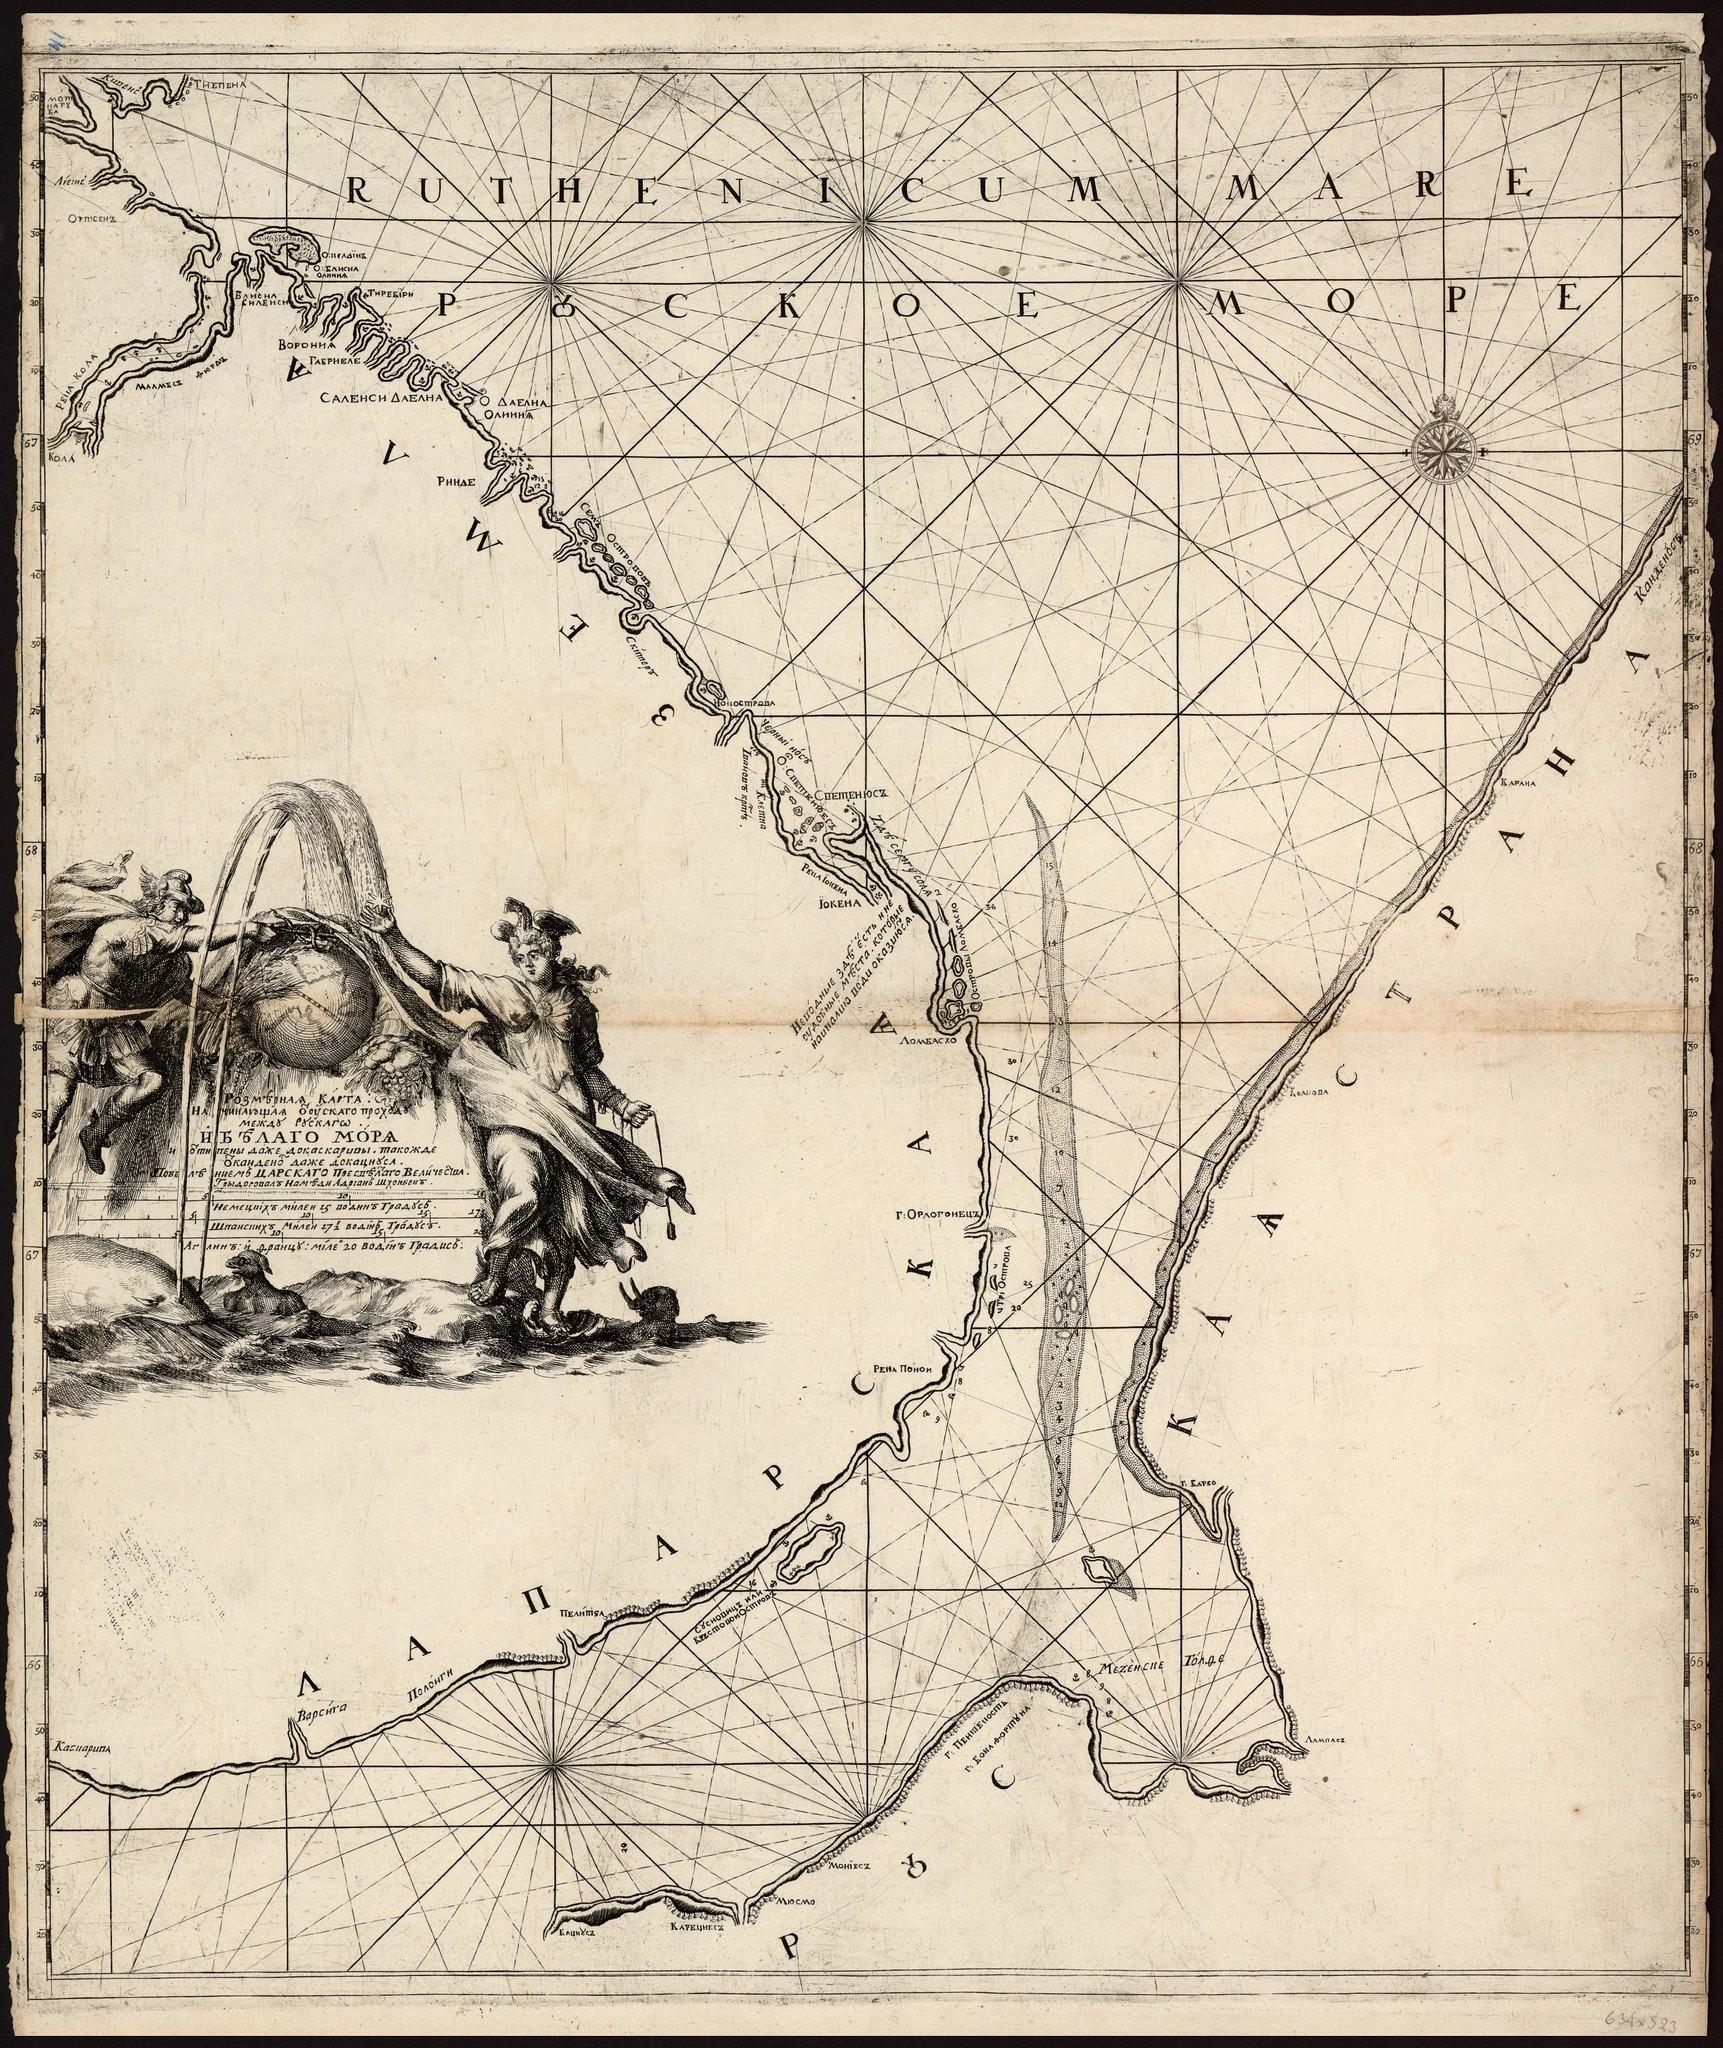 1702. Адриан Шхонебек. Розмерная карта начинающая от узкаго проходу между Рускаго и Белаго моря и от Типены даже до Каскаривы, такожде от Канденос даже до Кацнуса